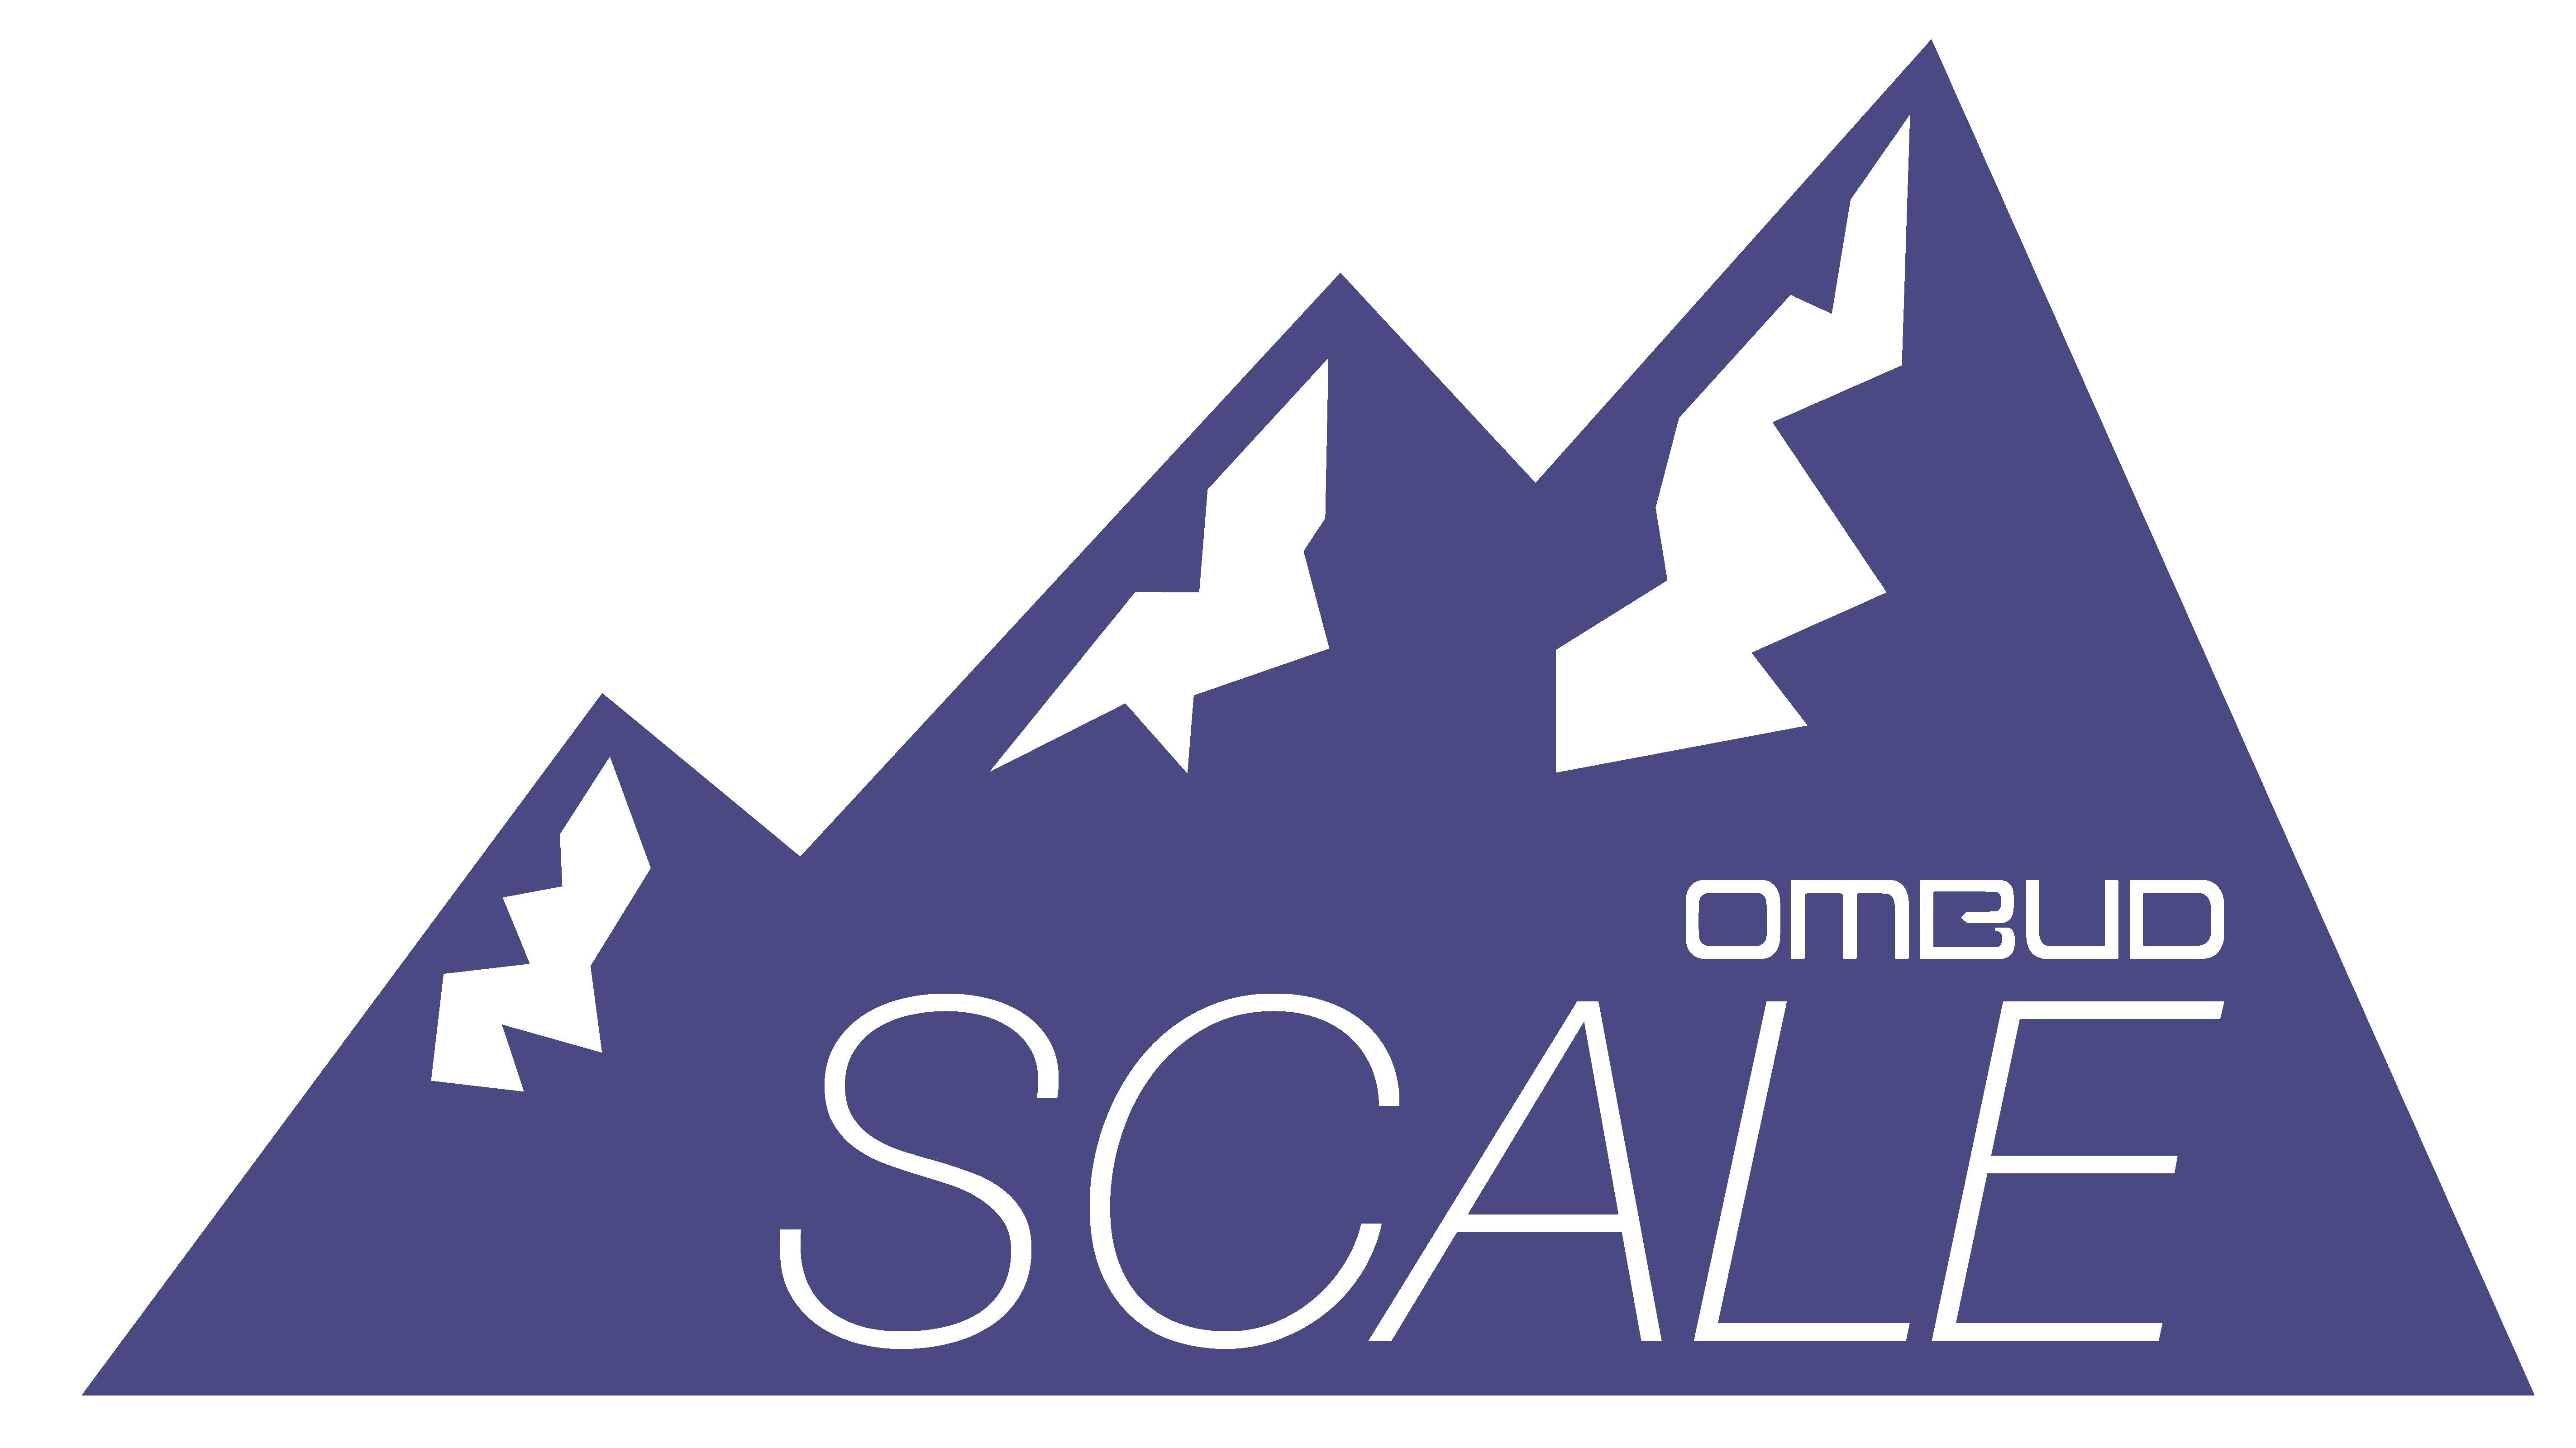 Ombud SCALE logo